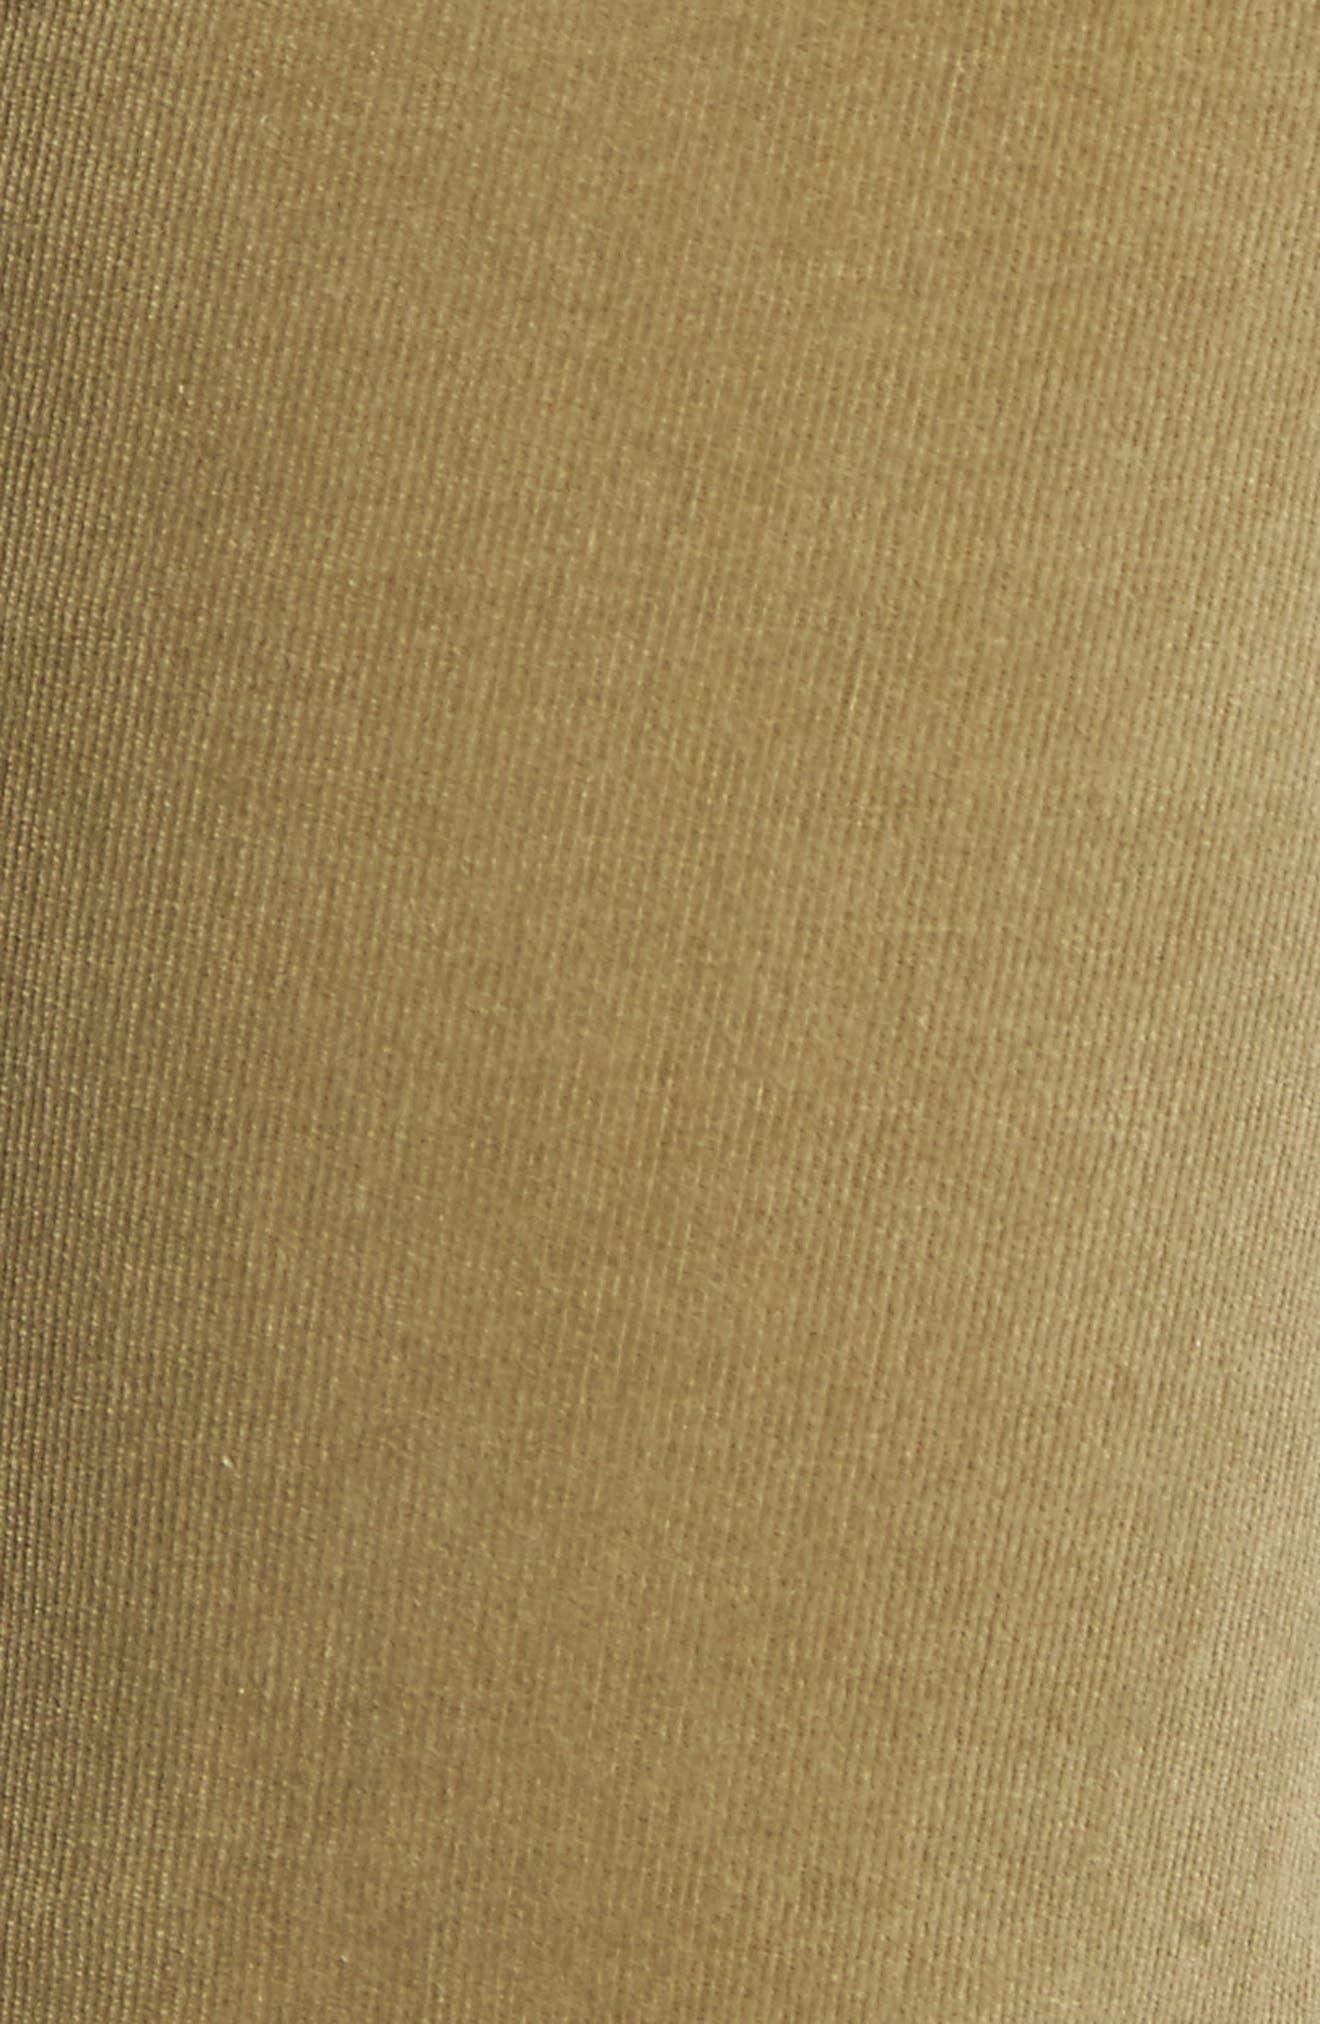 'Diana' Stretch Corduroy Skinny Pants,                             Alternate thumbnail 232, color,